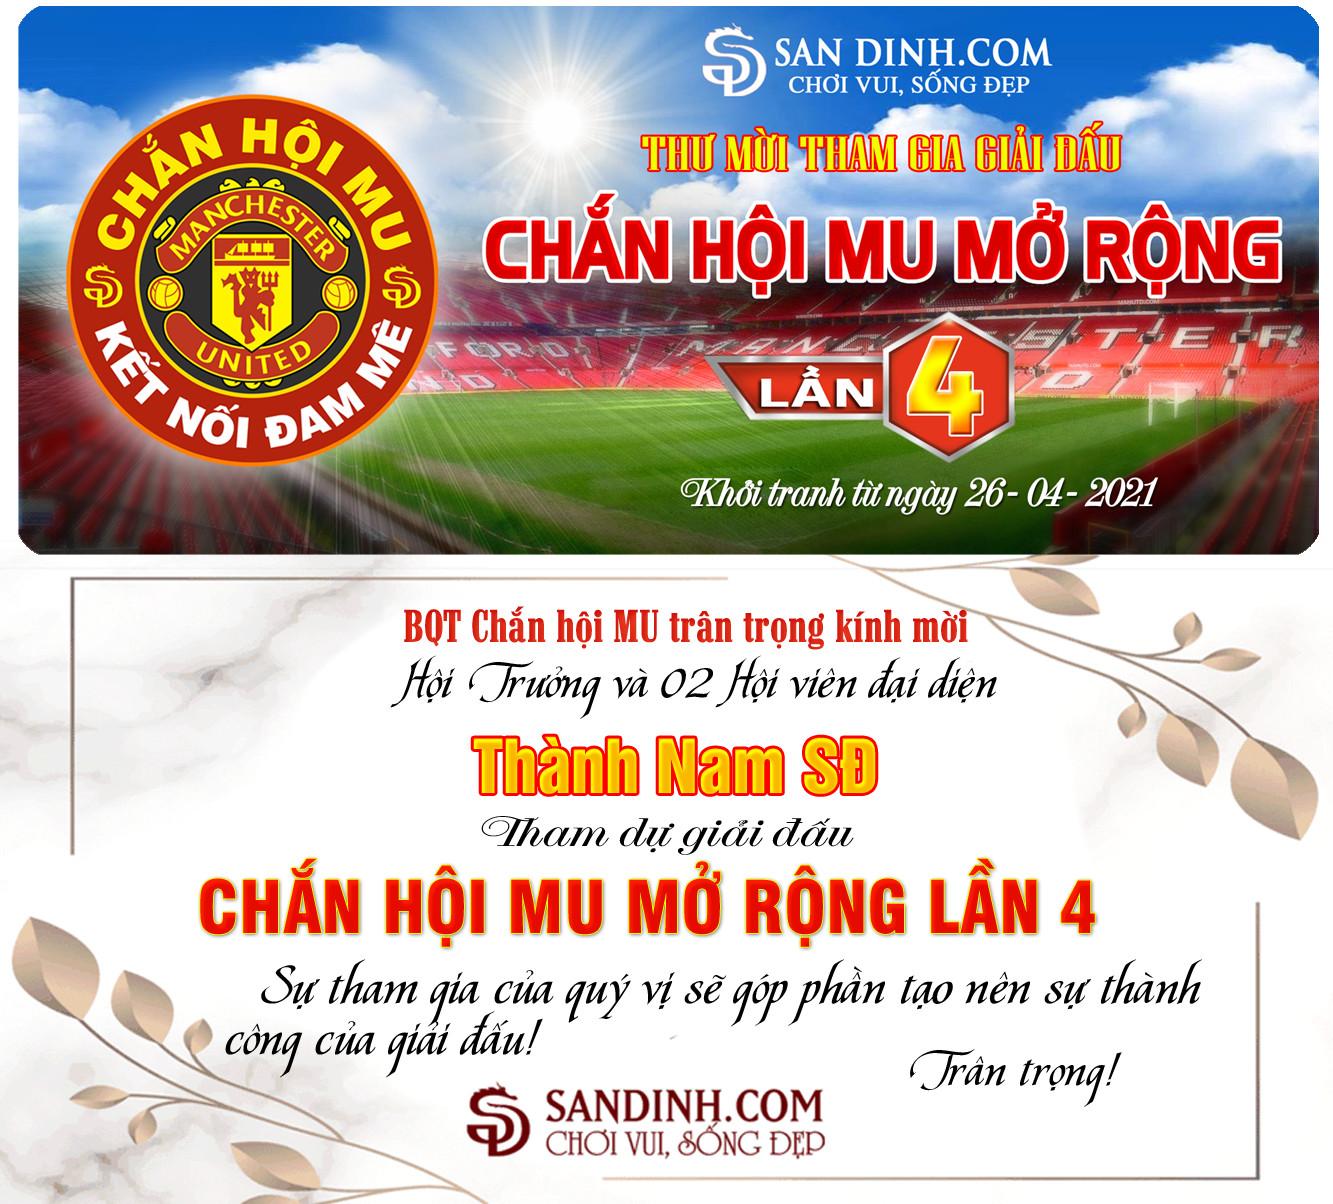 Thanh Nam SD.